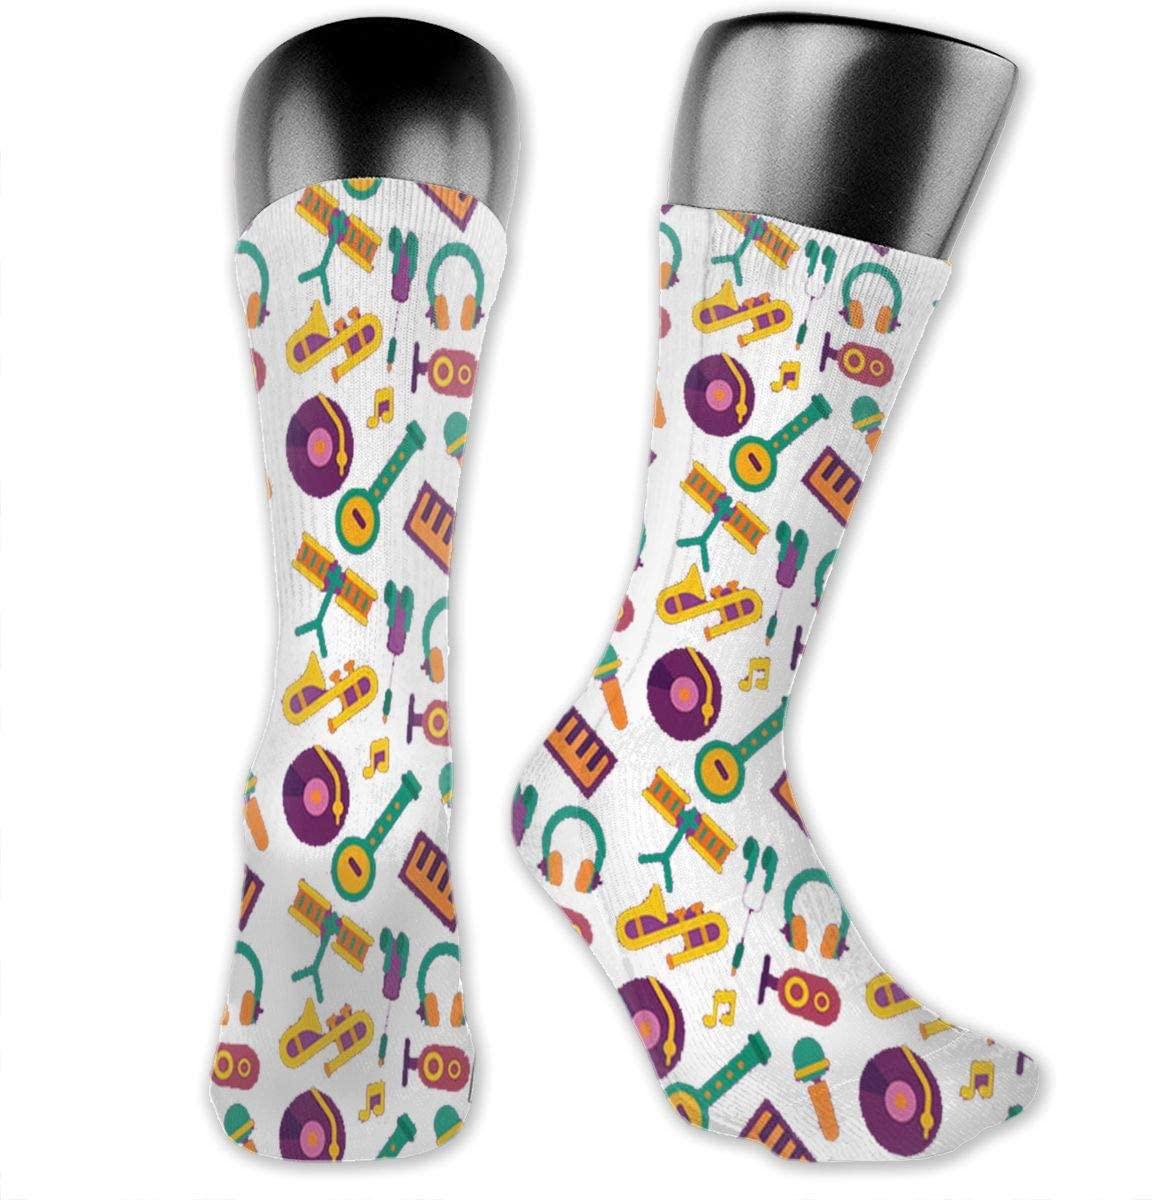 Musical Instrument Notes Unisex Outdoor Long Socks Sport Athletic Crew Socks Stockings